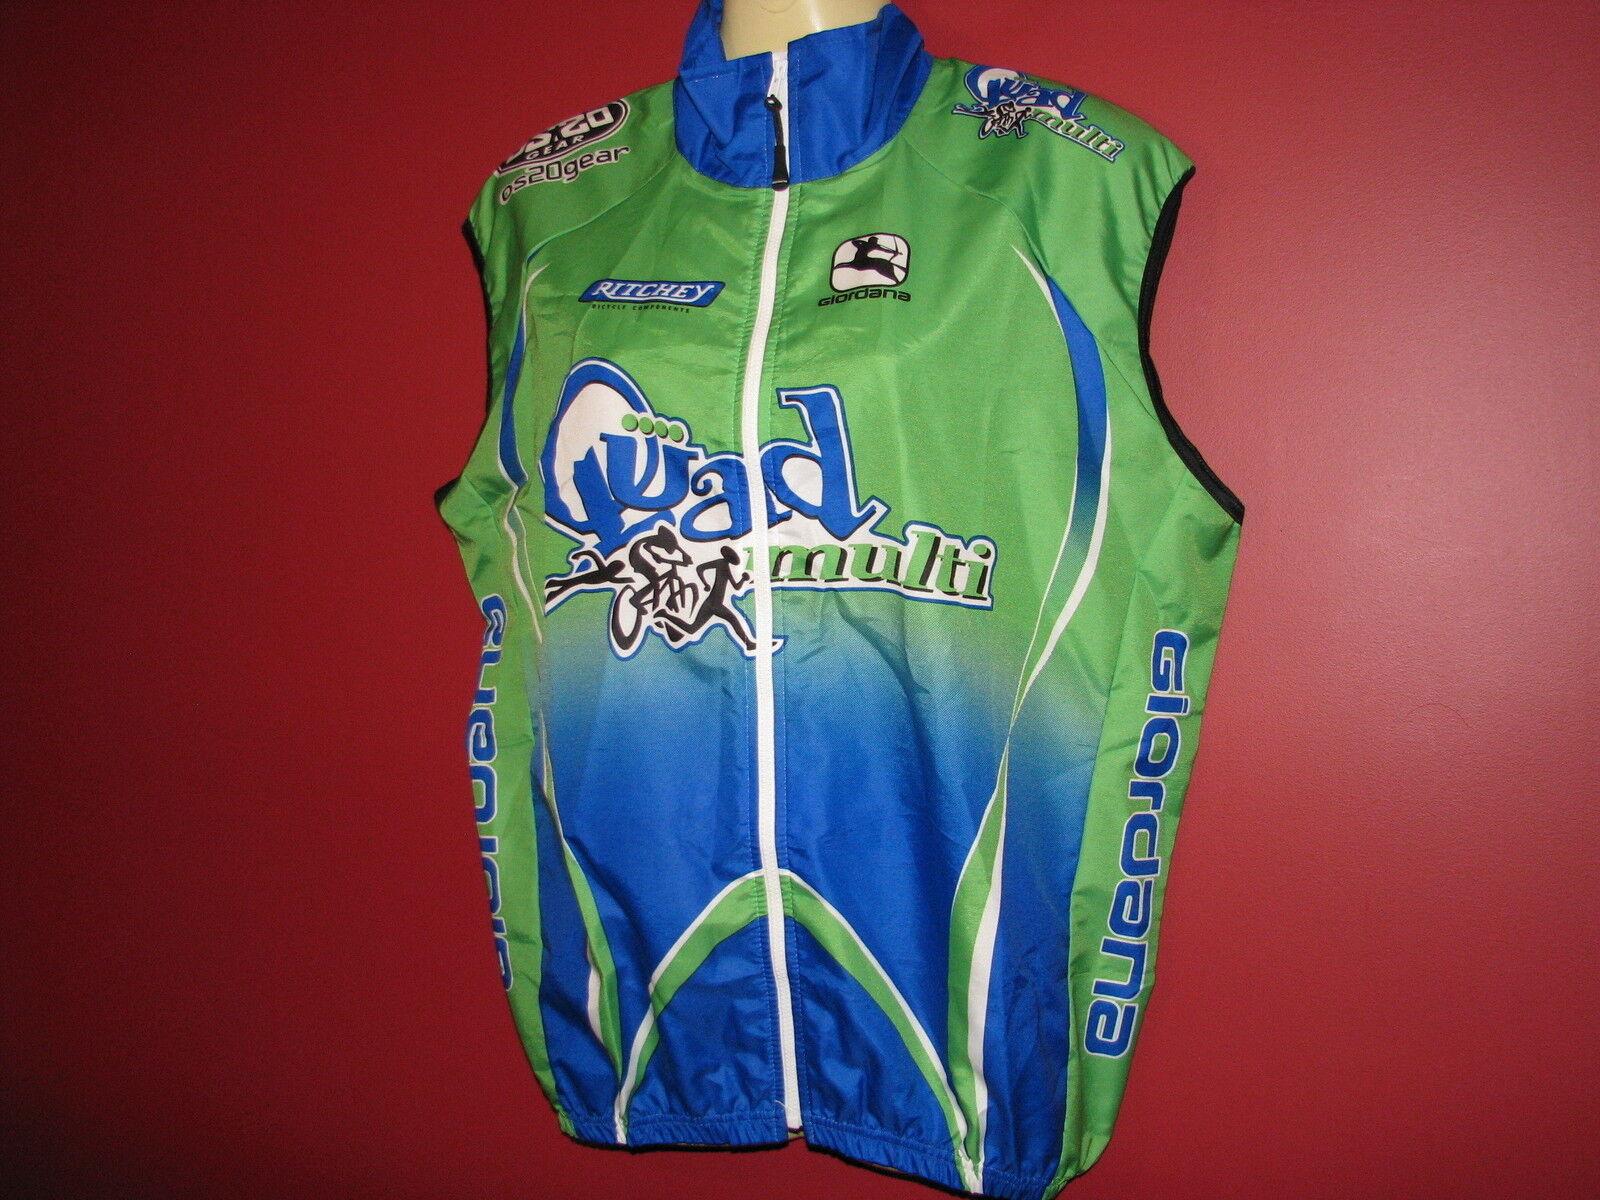 GIORDANA Women's GI-QUMS Cycling Wind Vest - Size Small - NWT